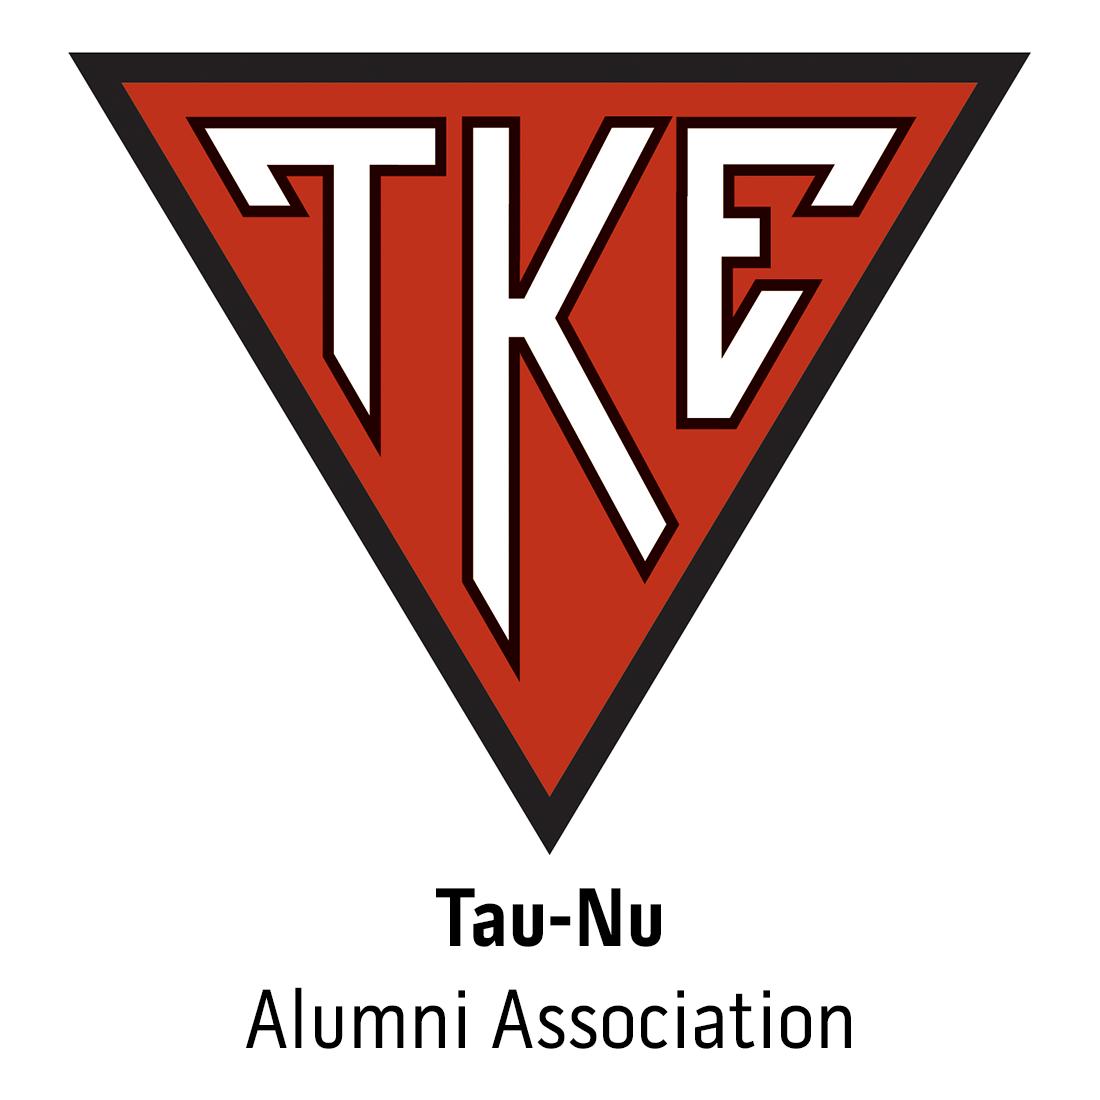 Tau-Nu Alumni Association Alumni at Shawnee State University